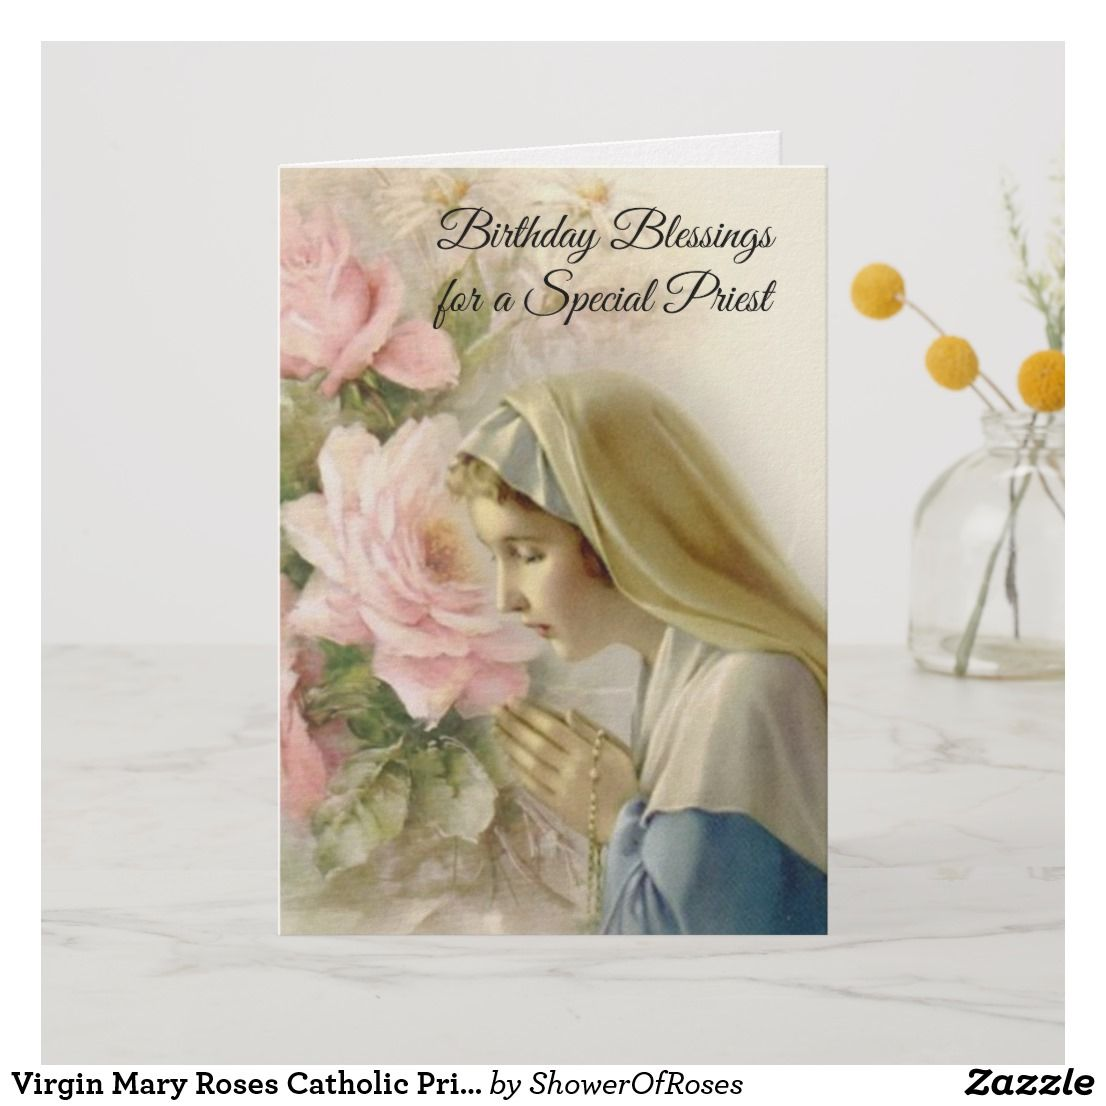 Virgin Mary Roses Catholic Priest Birthday Prayer Card